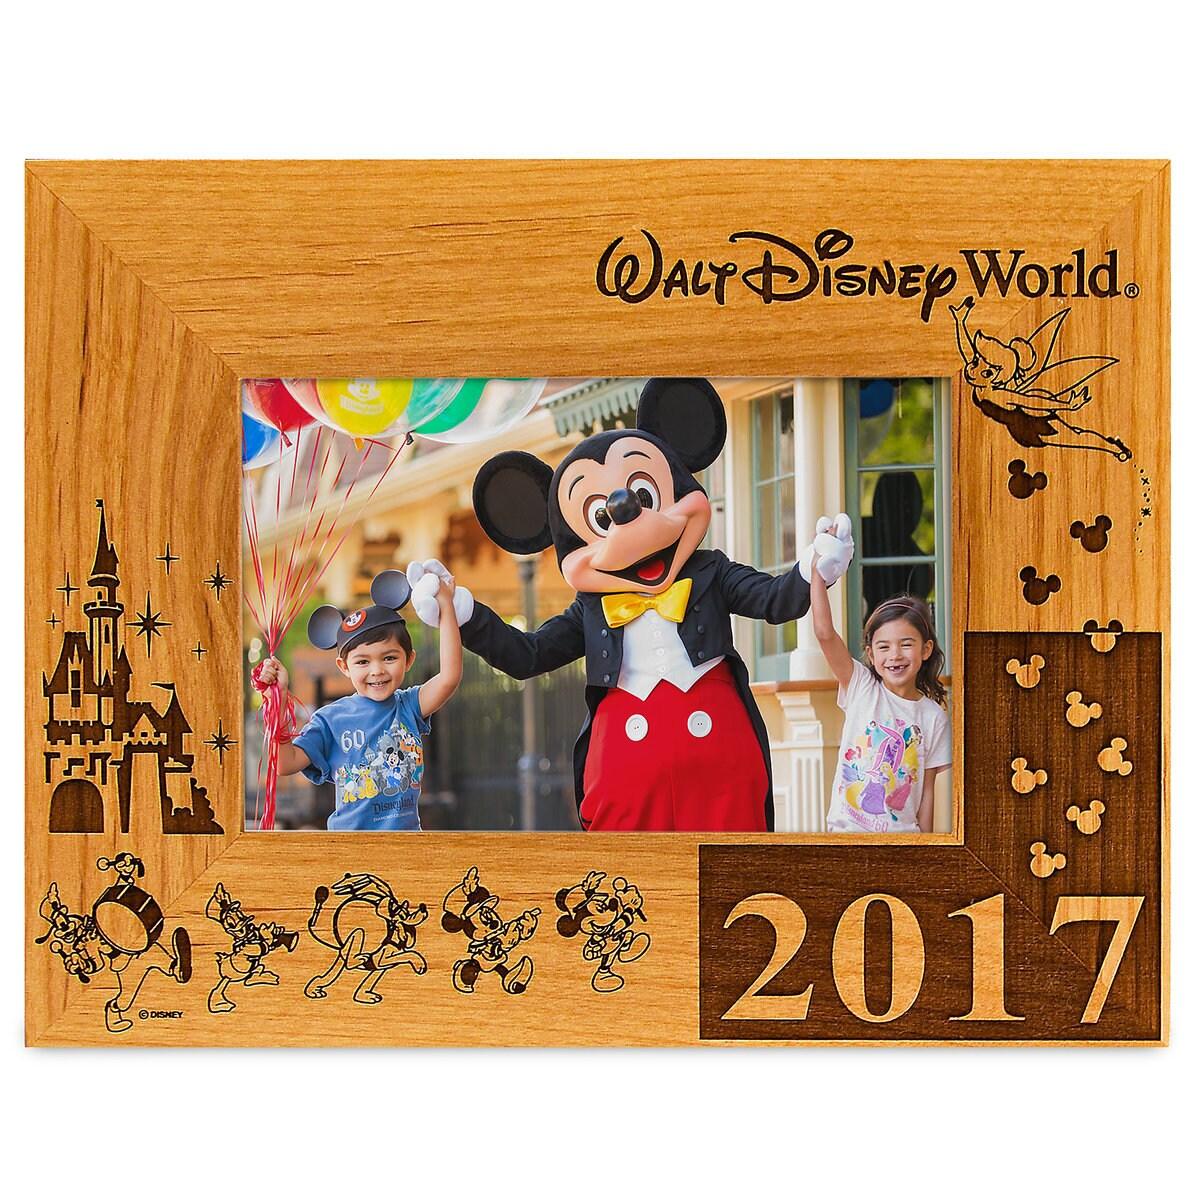 walt disney world 2017 frame by arribas 4 x 6 - Disney World Picture Frames